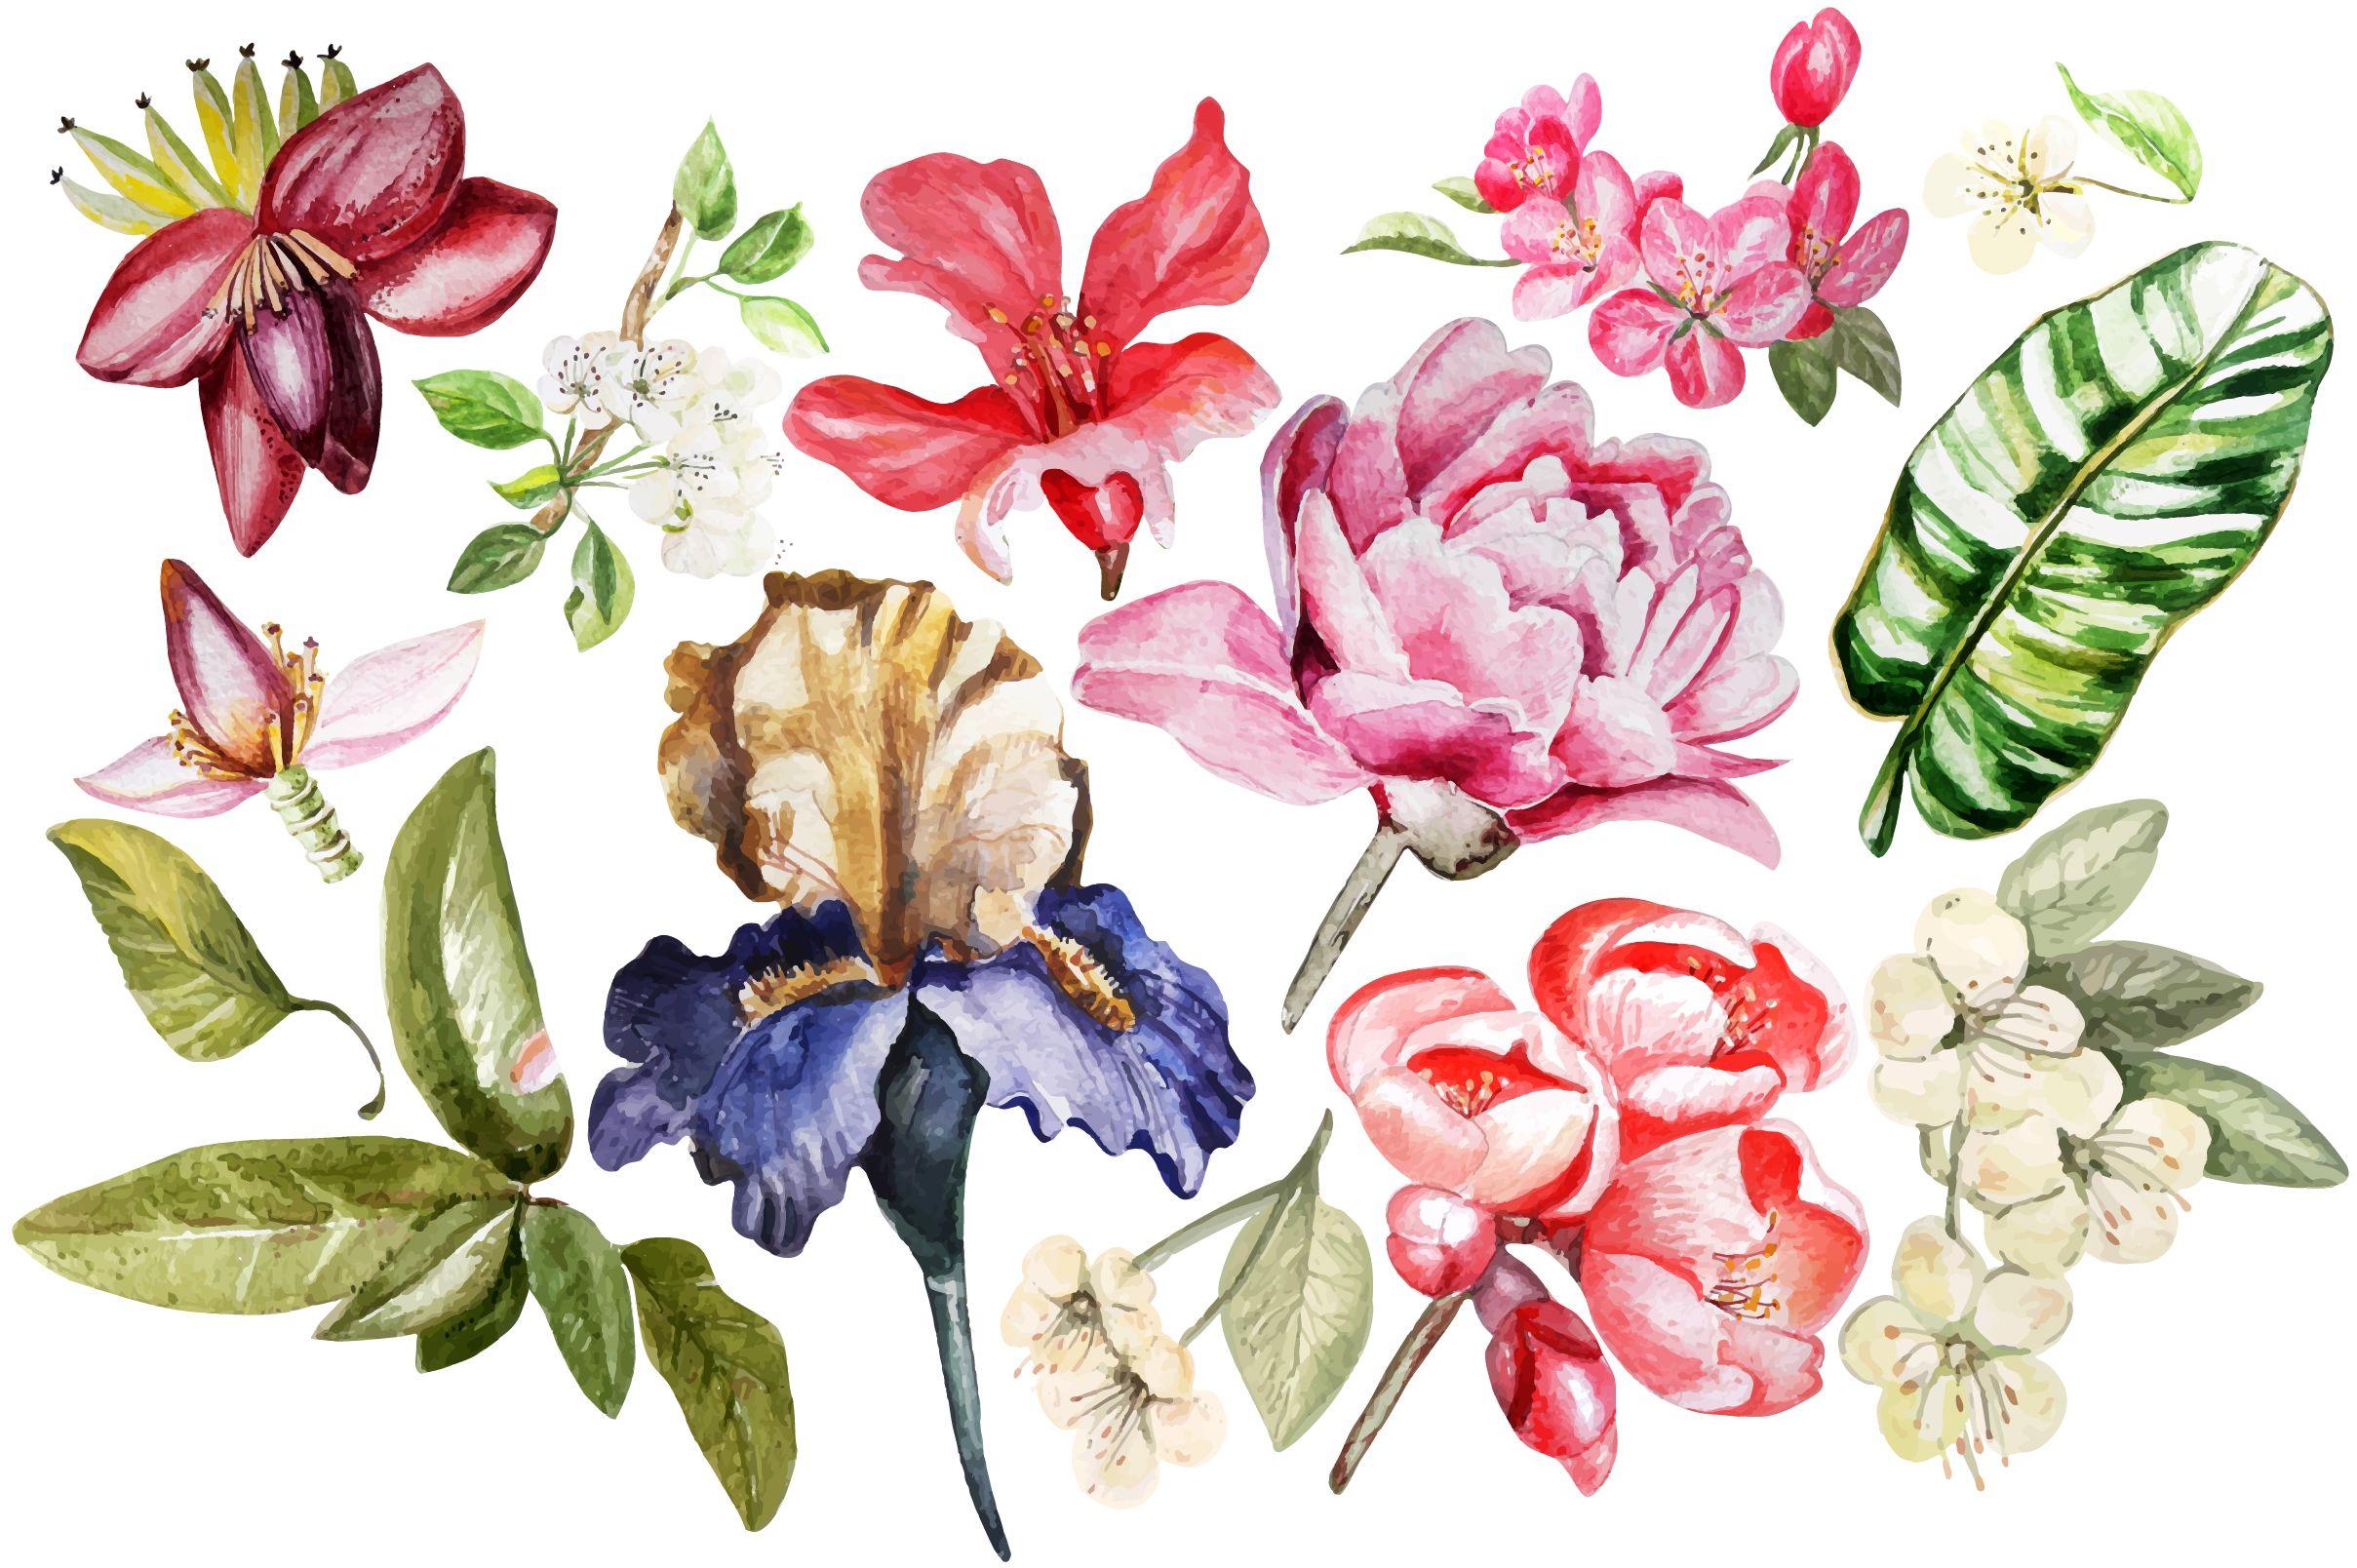 Beautiful Watercolor Flowers By Knopazyzy On Creativemarket